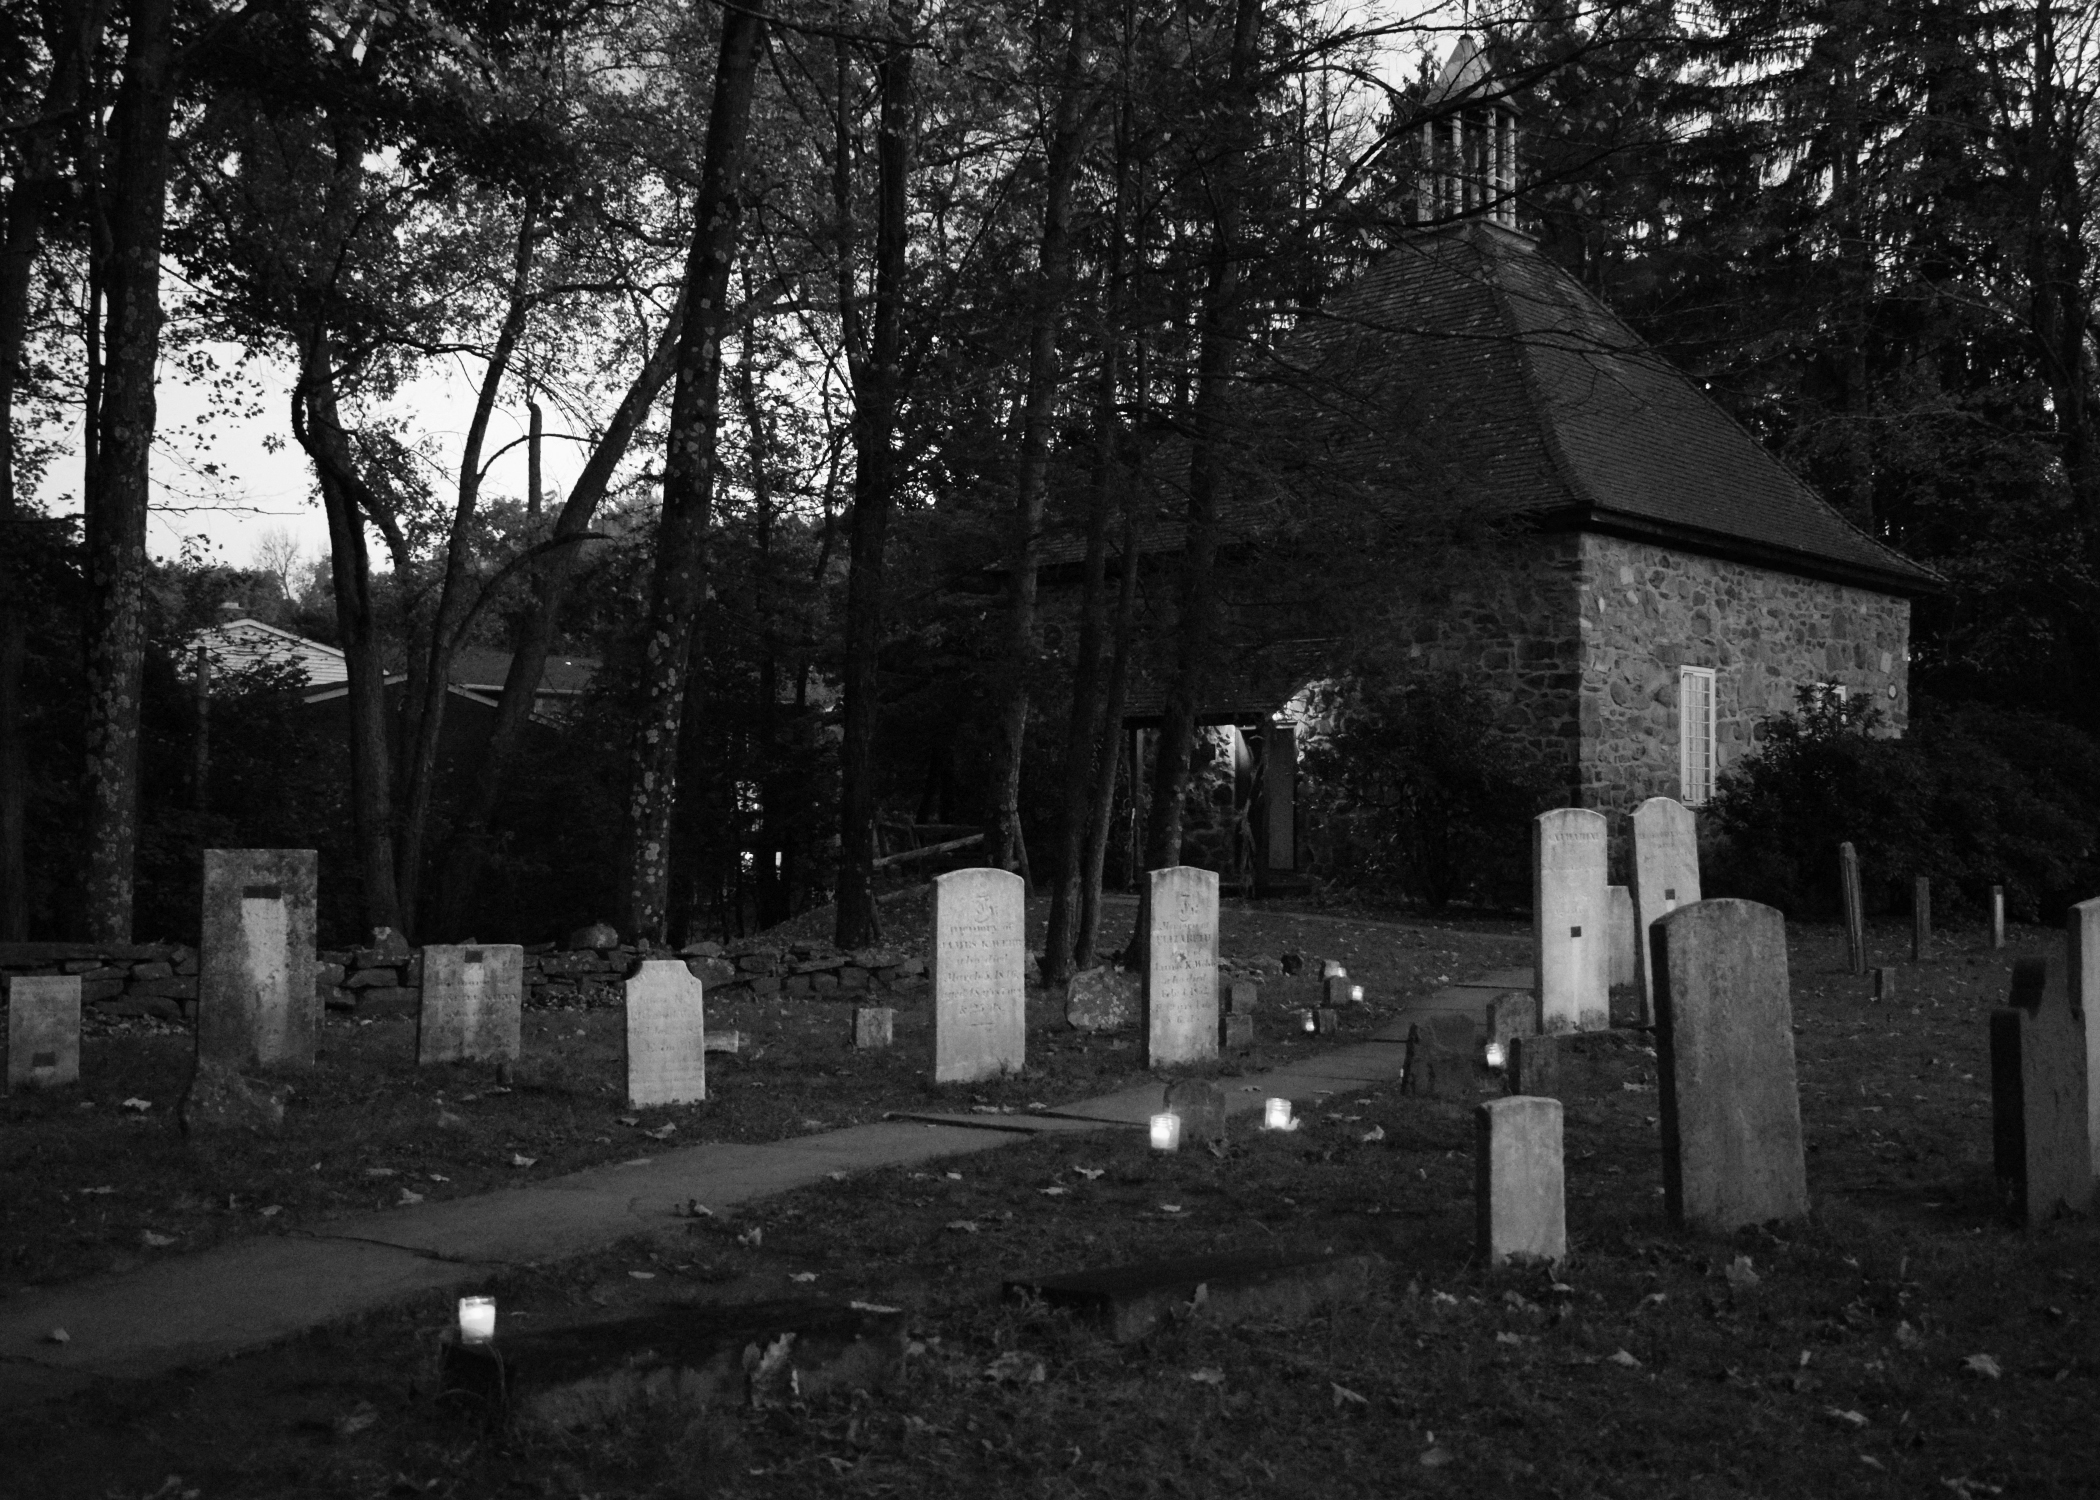 Haunted Huguenot Street - Evenings throughout October